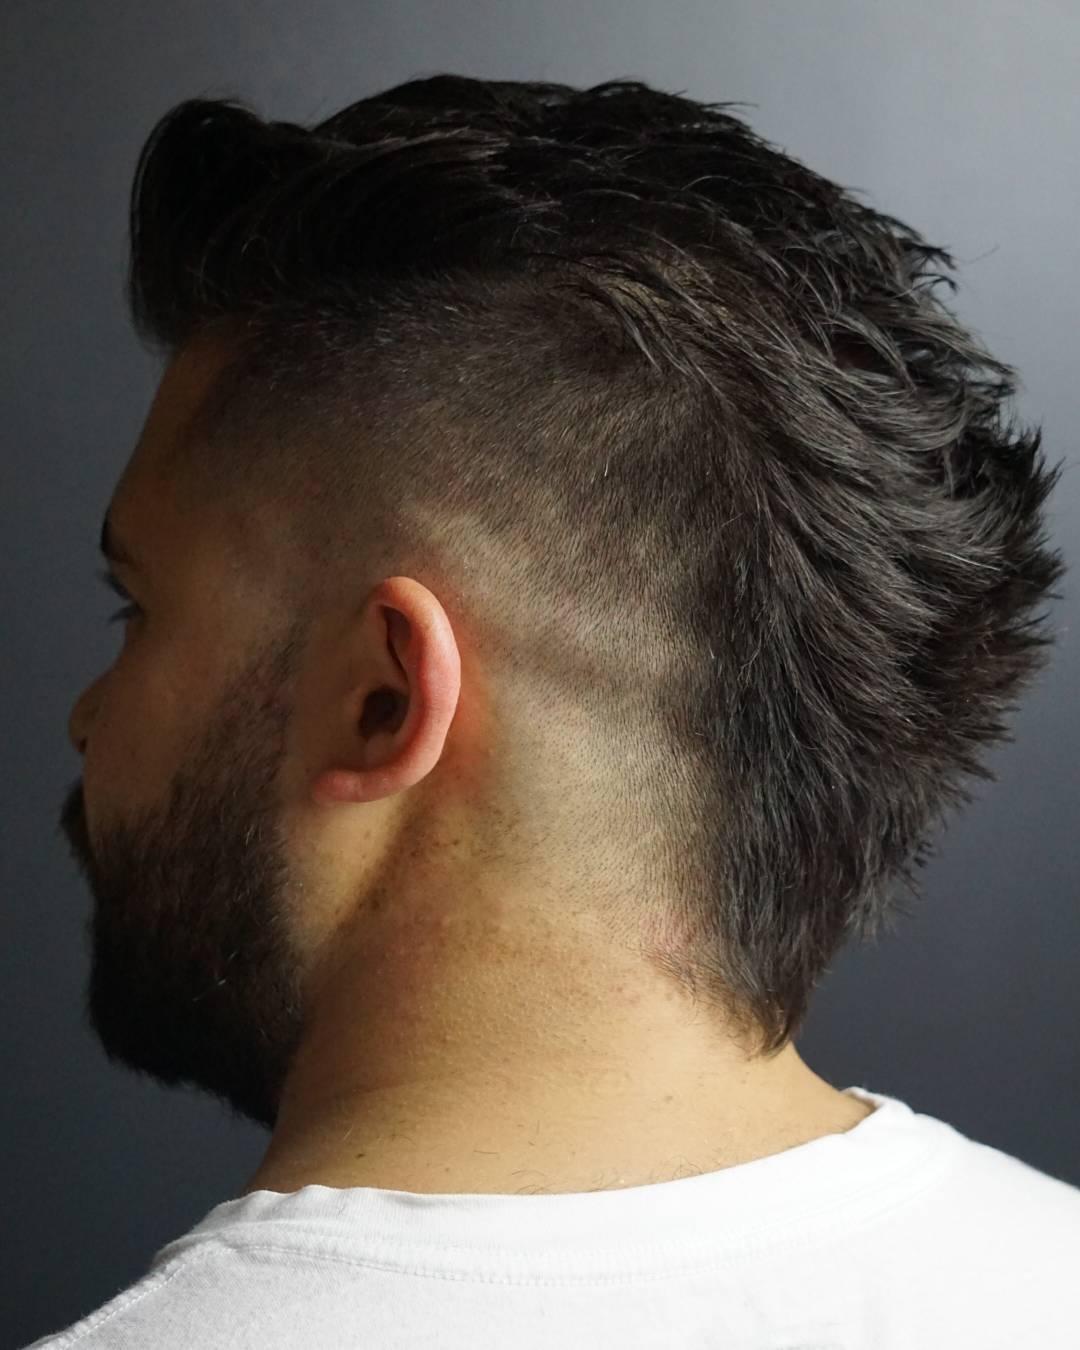 Mohawk undercut hairstyle